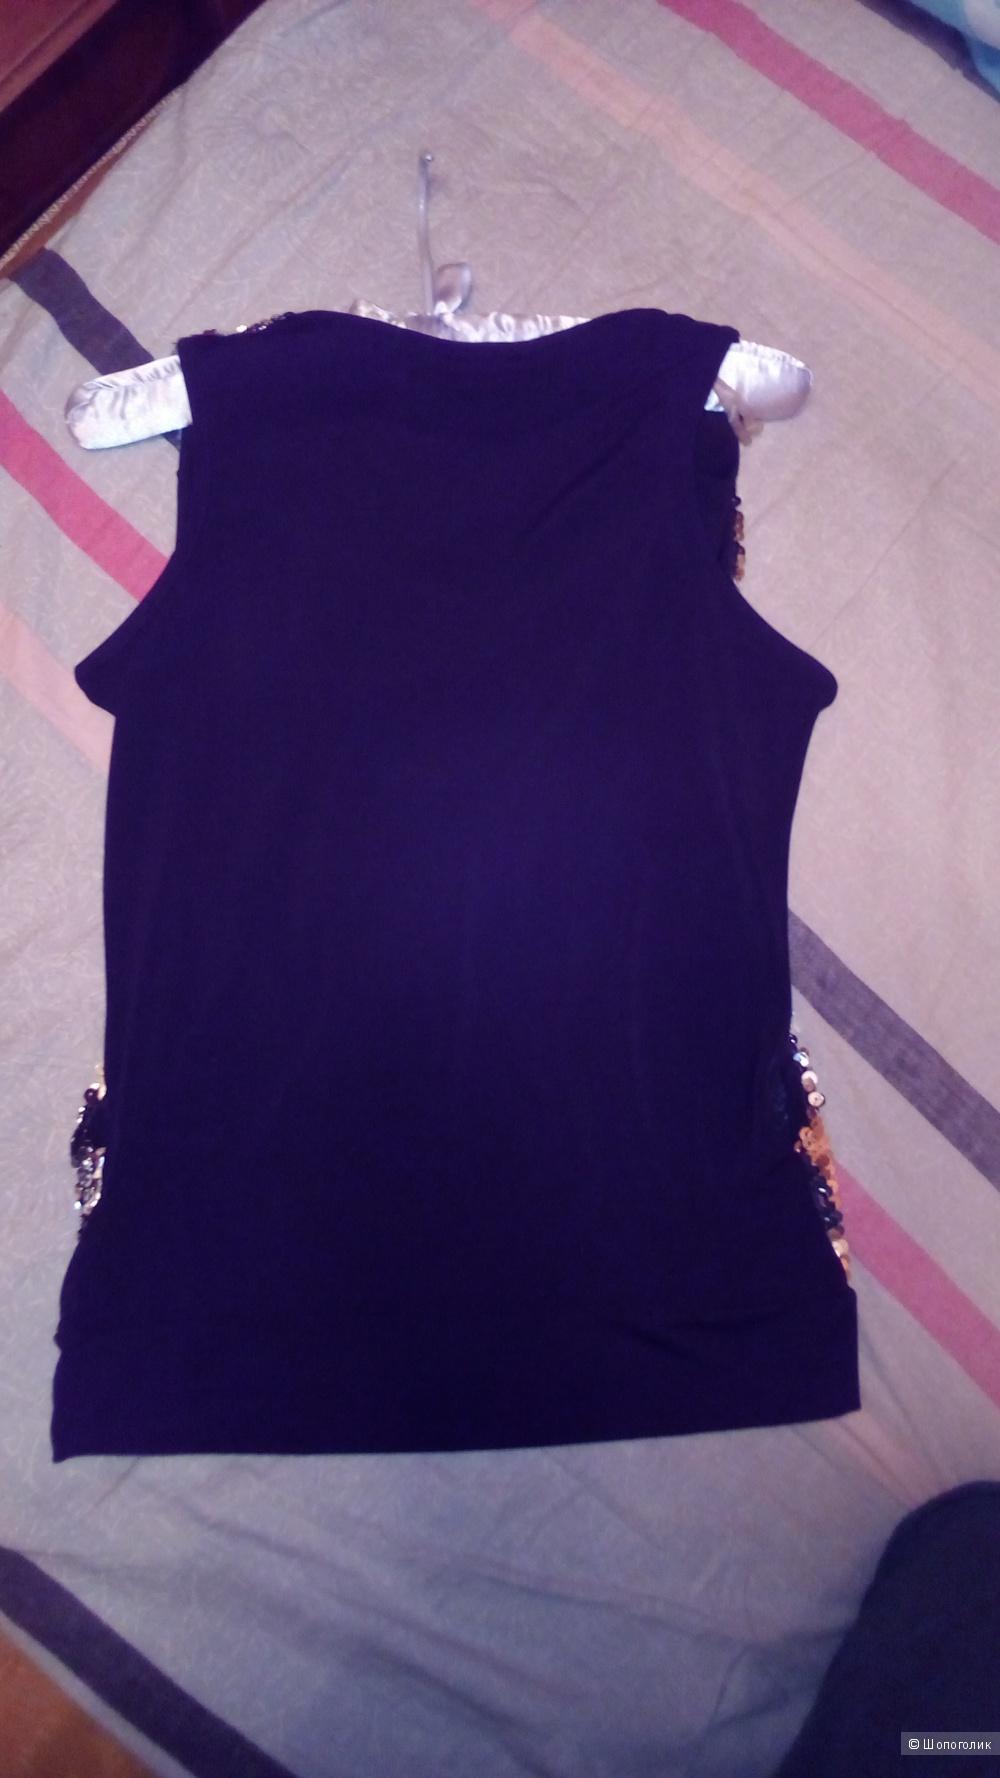 Блузка нарядная, RODIN easy, подойдёт на 42 -44 росс.размер